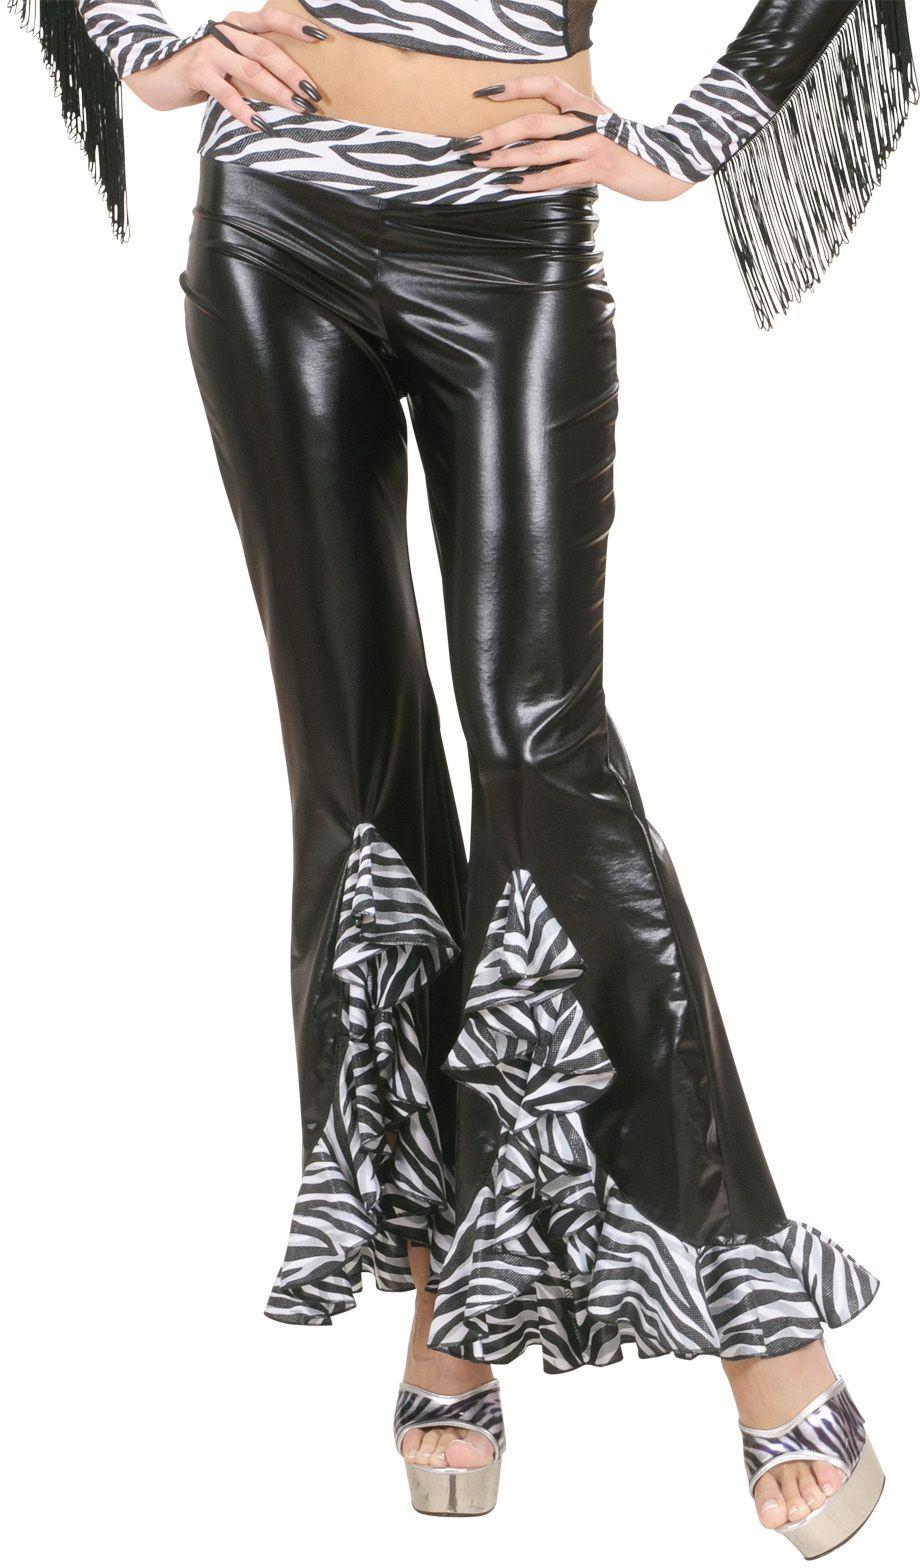 Zebra broek dames